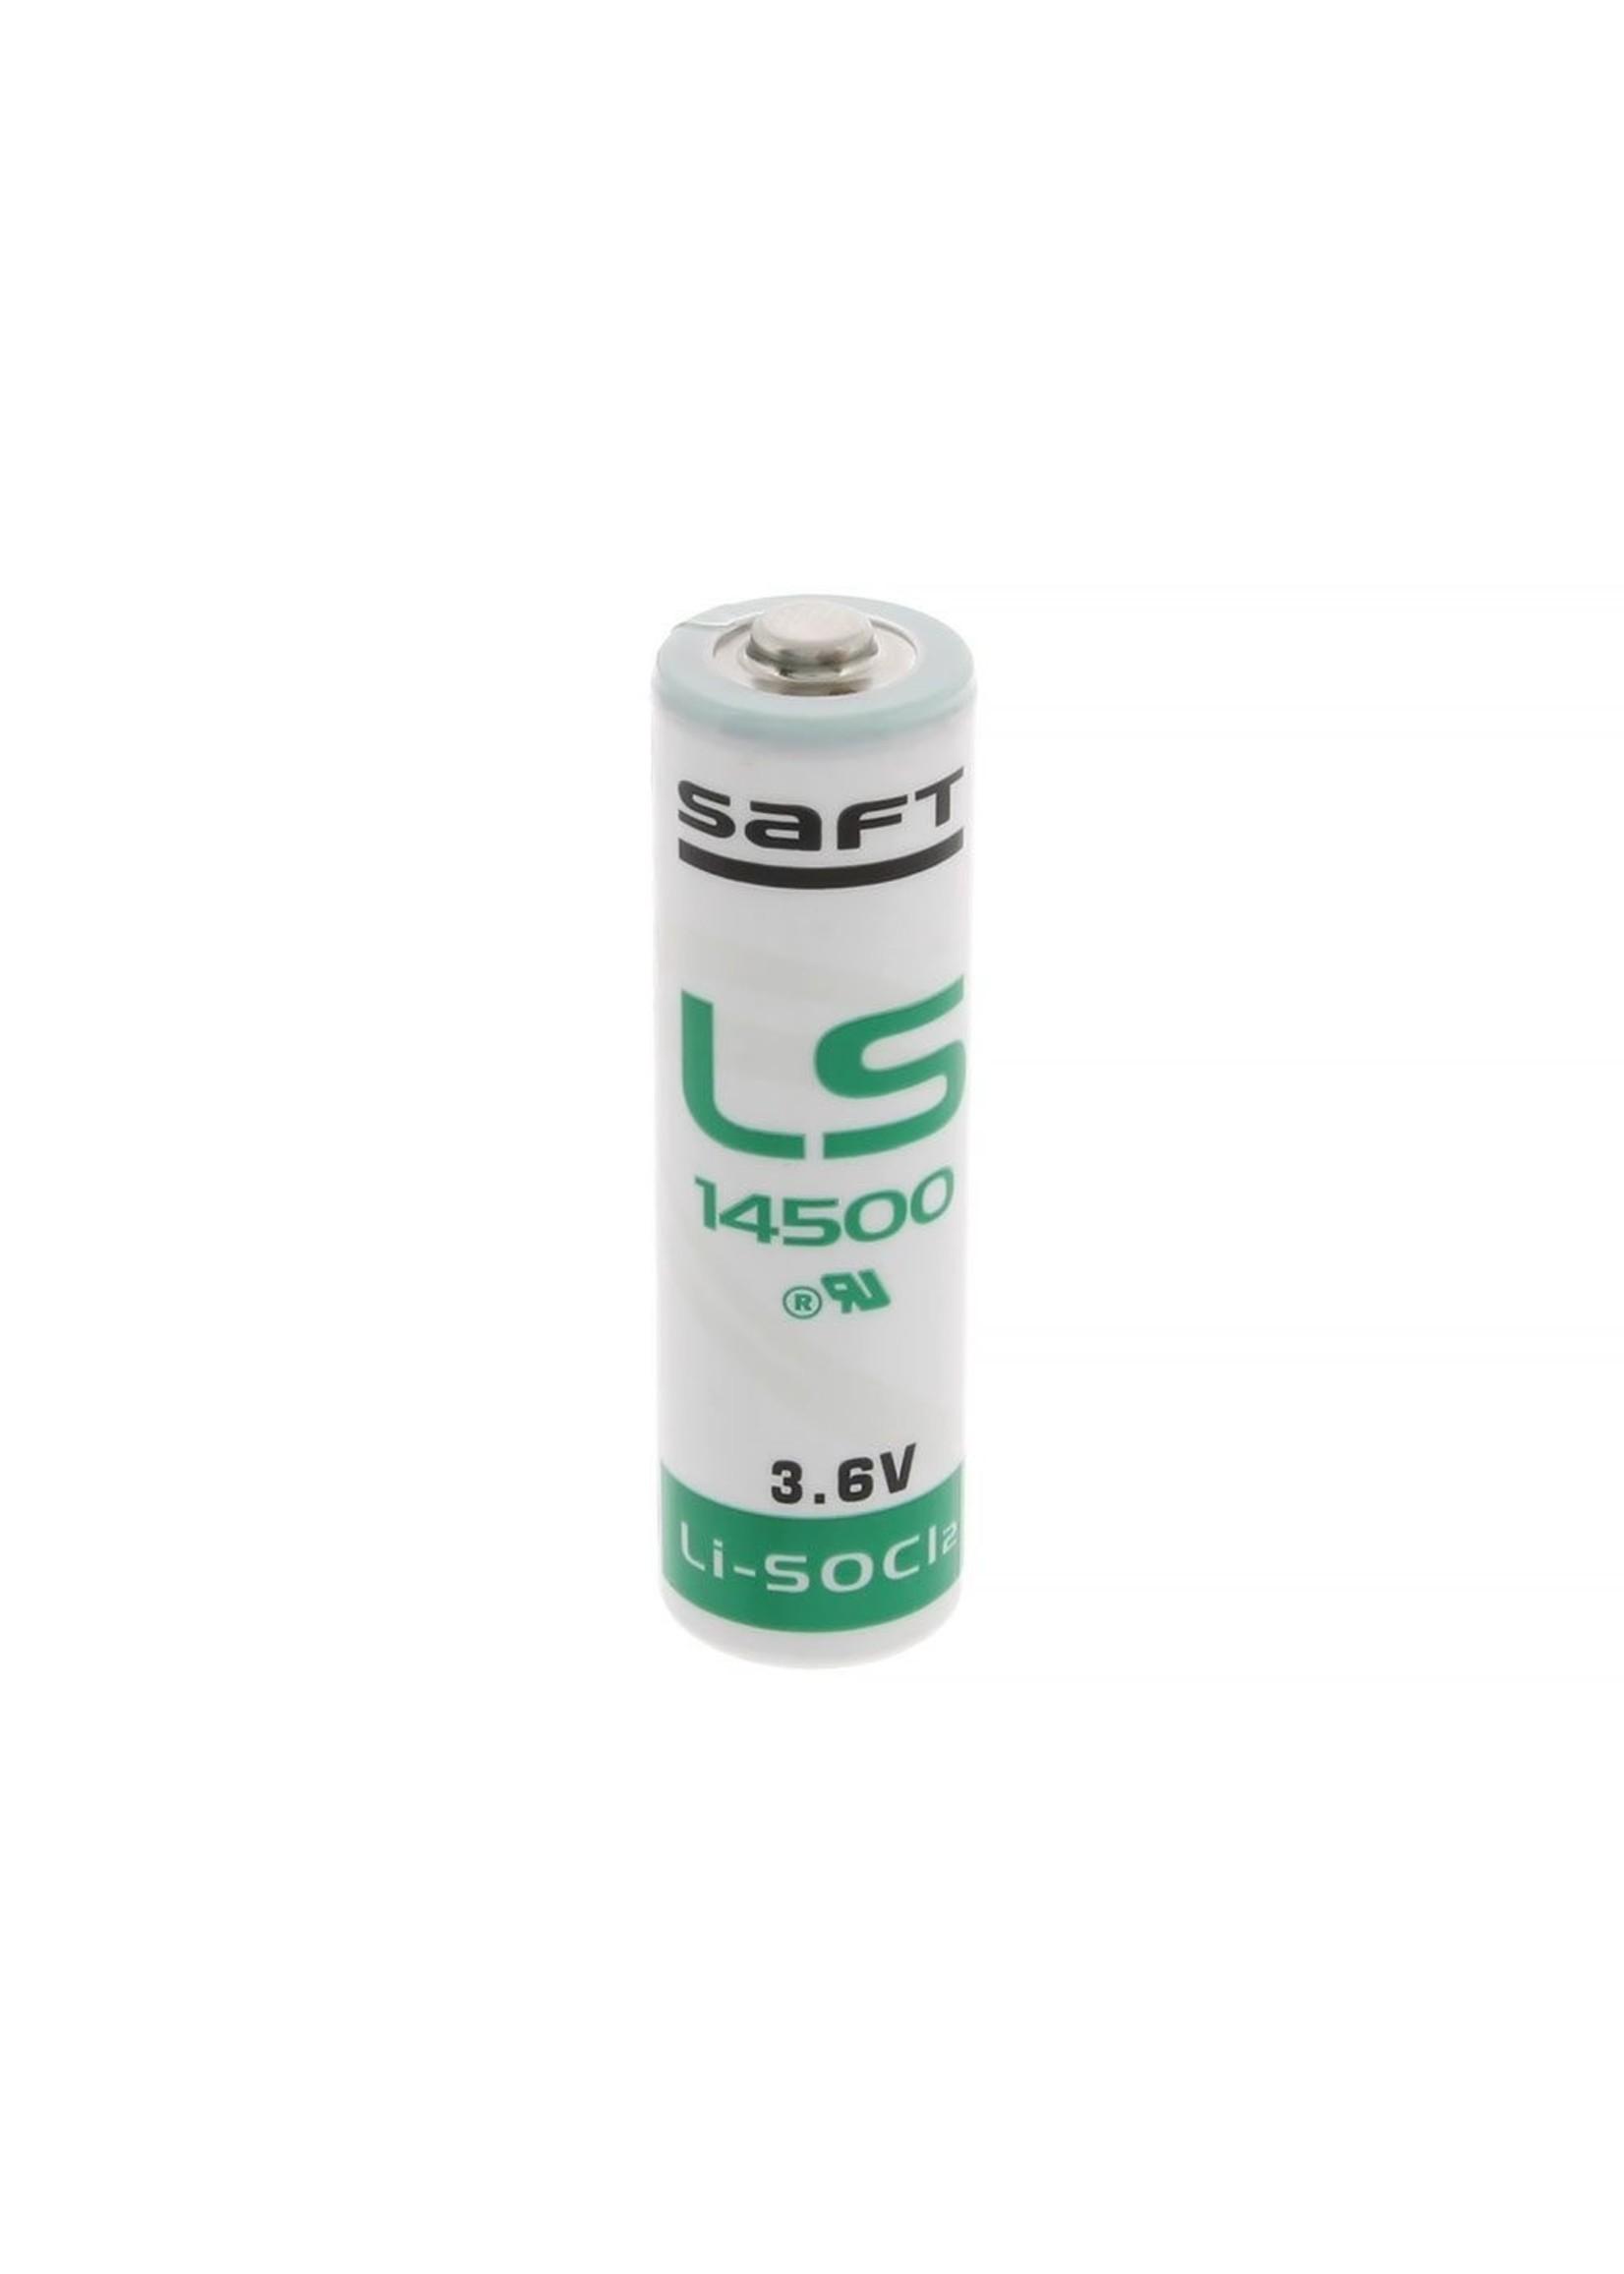 Shearwater LS14500 AA Lithium 3,6V Batterij